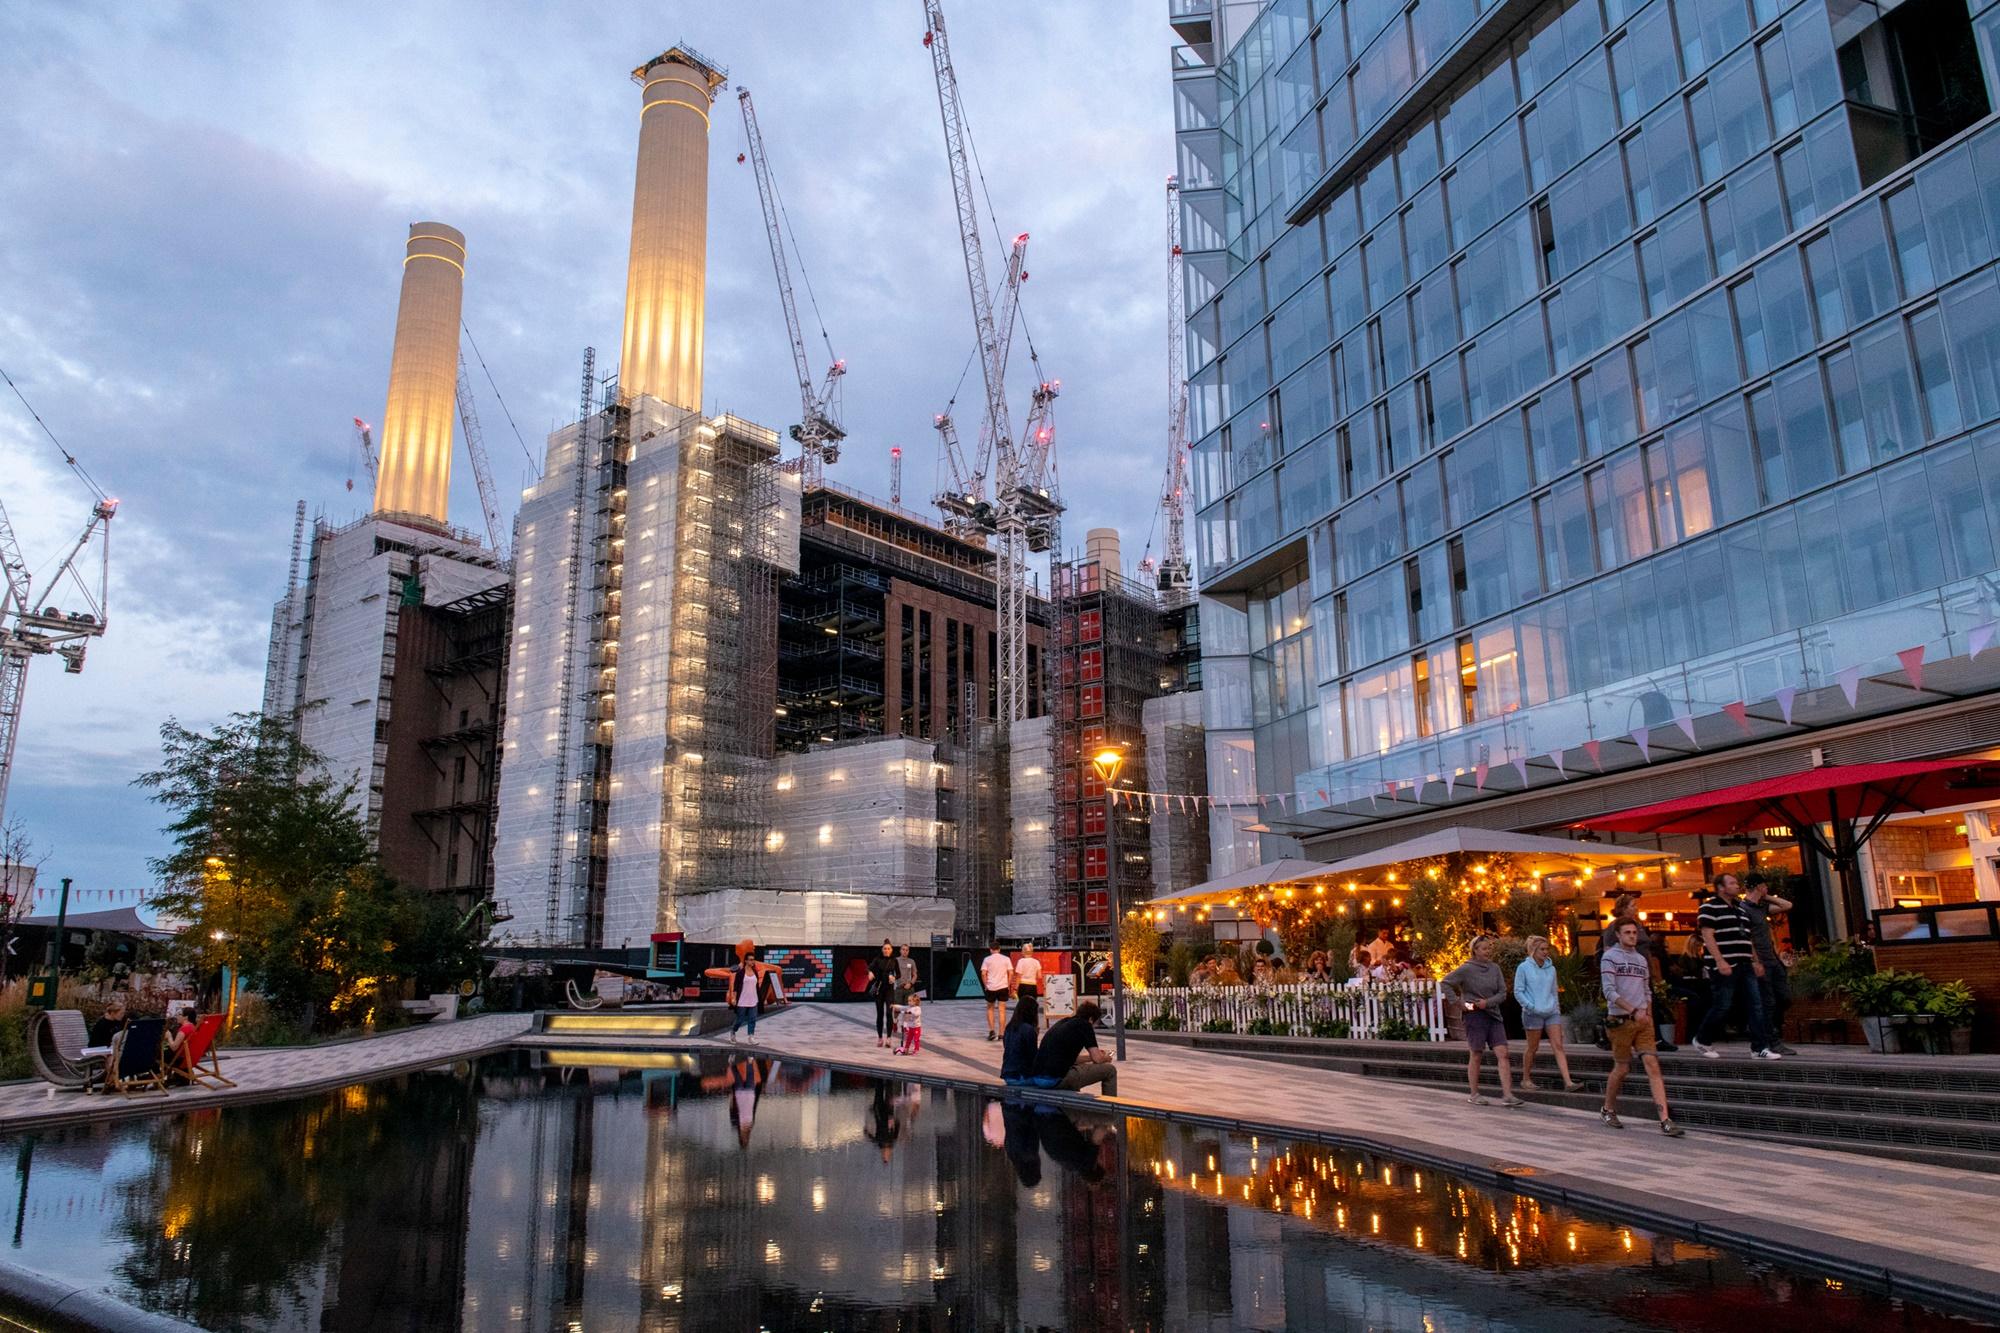 Battersea Power Station retail development